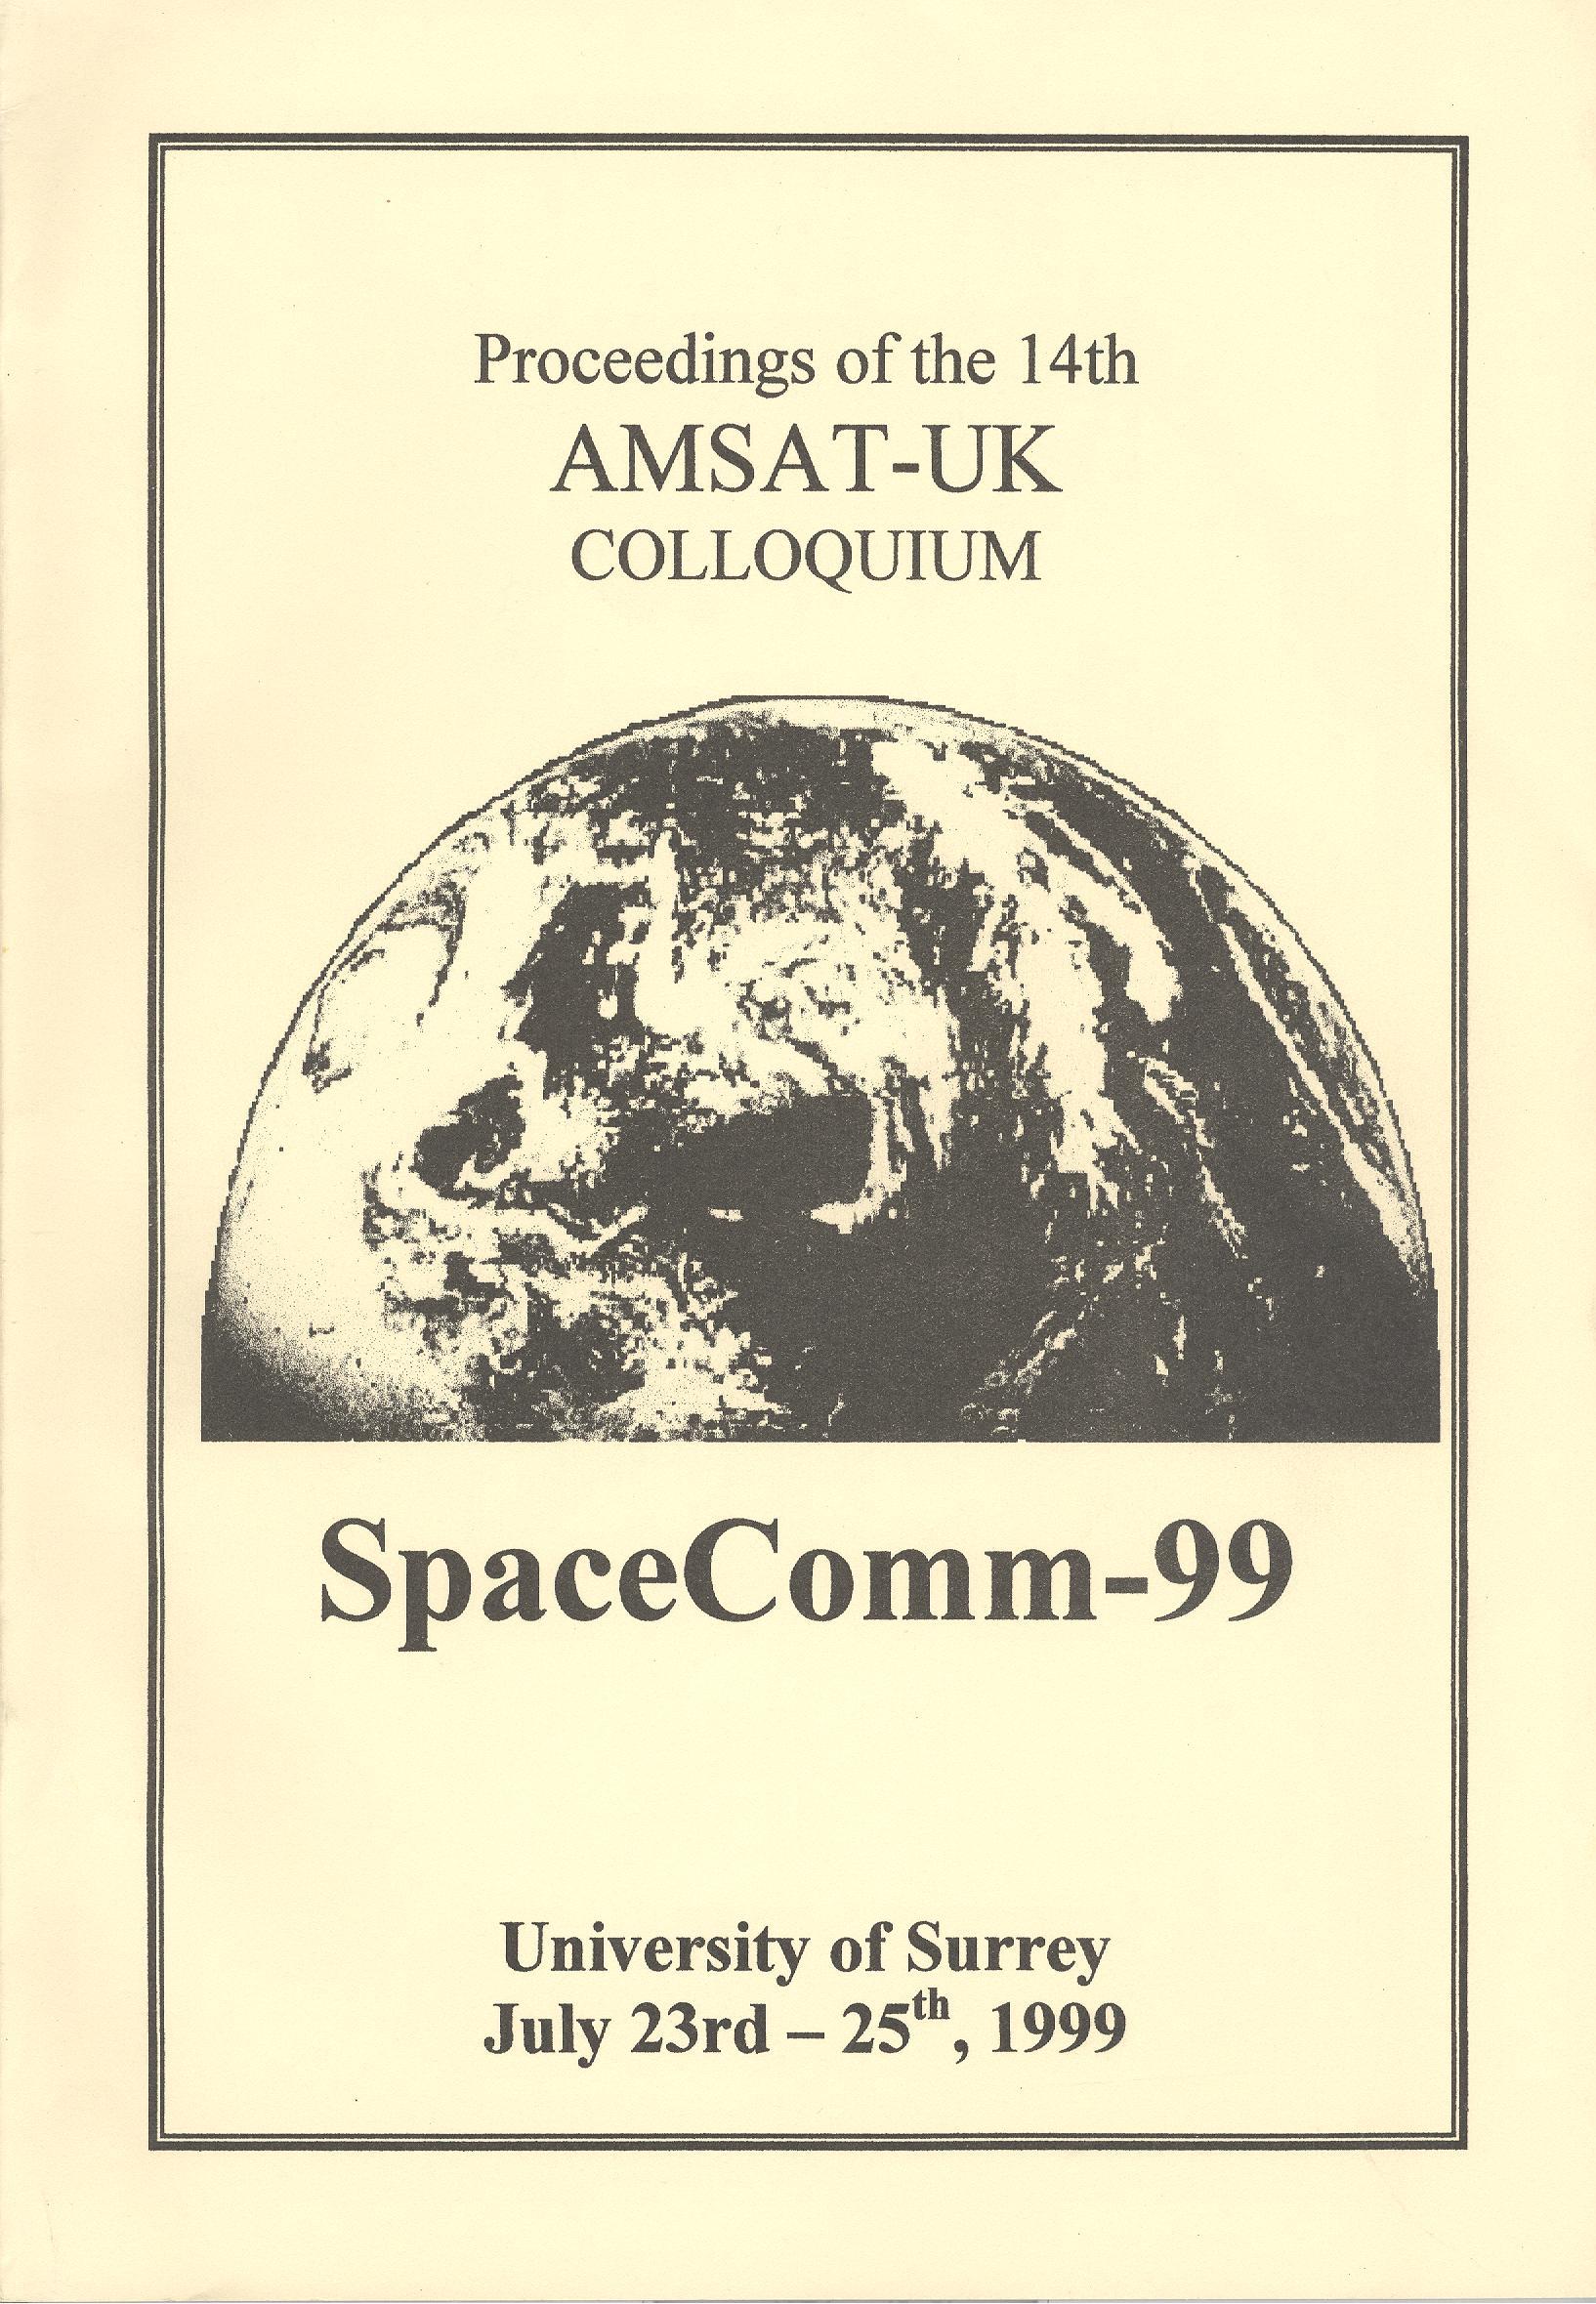 The Proceedings of the 14th AMSAT-UK Colloquium - SpaceComm-99